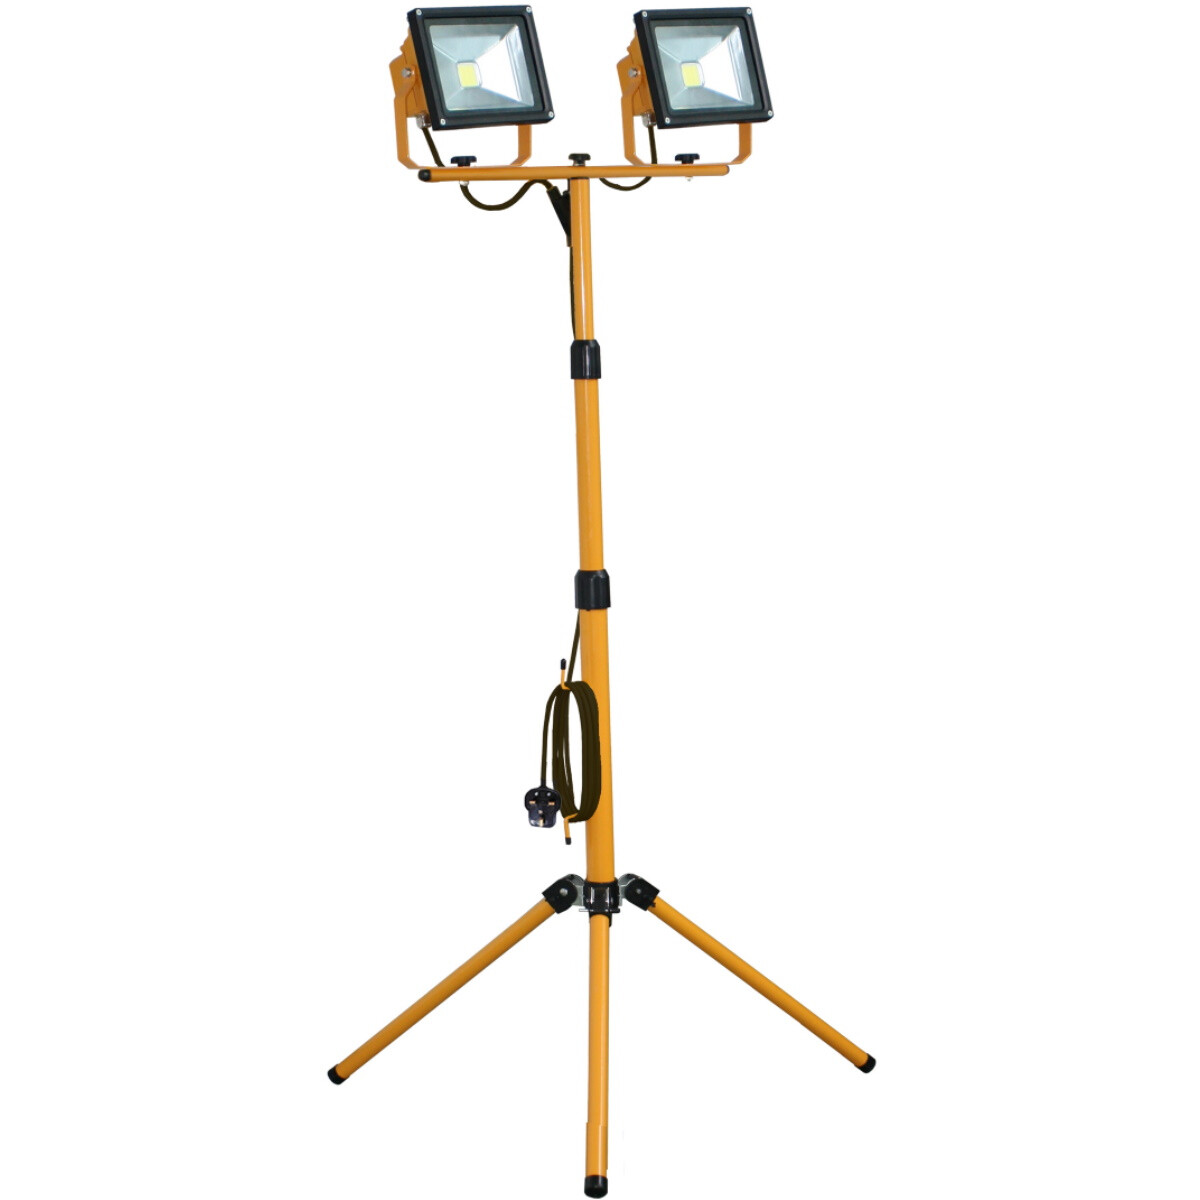 Spectre SP-17193 230V HD Twin 20W COB LED Floodlight Work Light